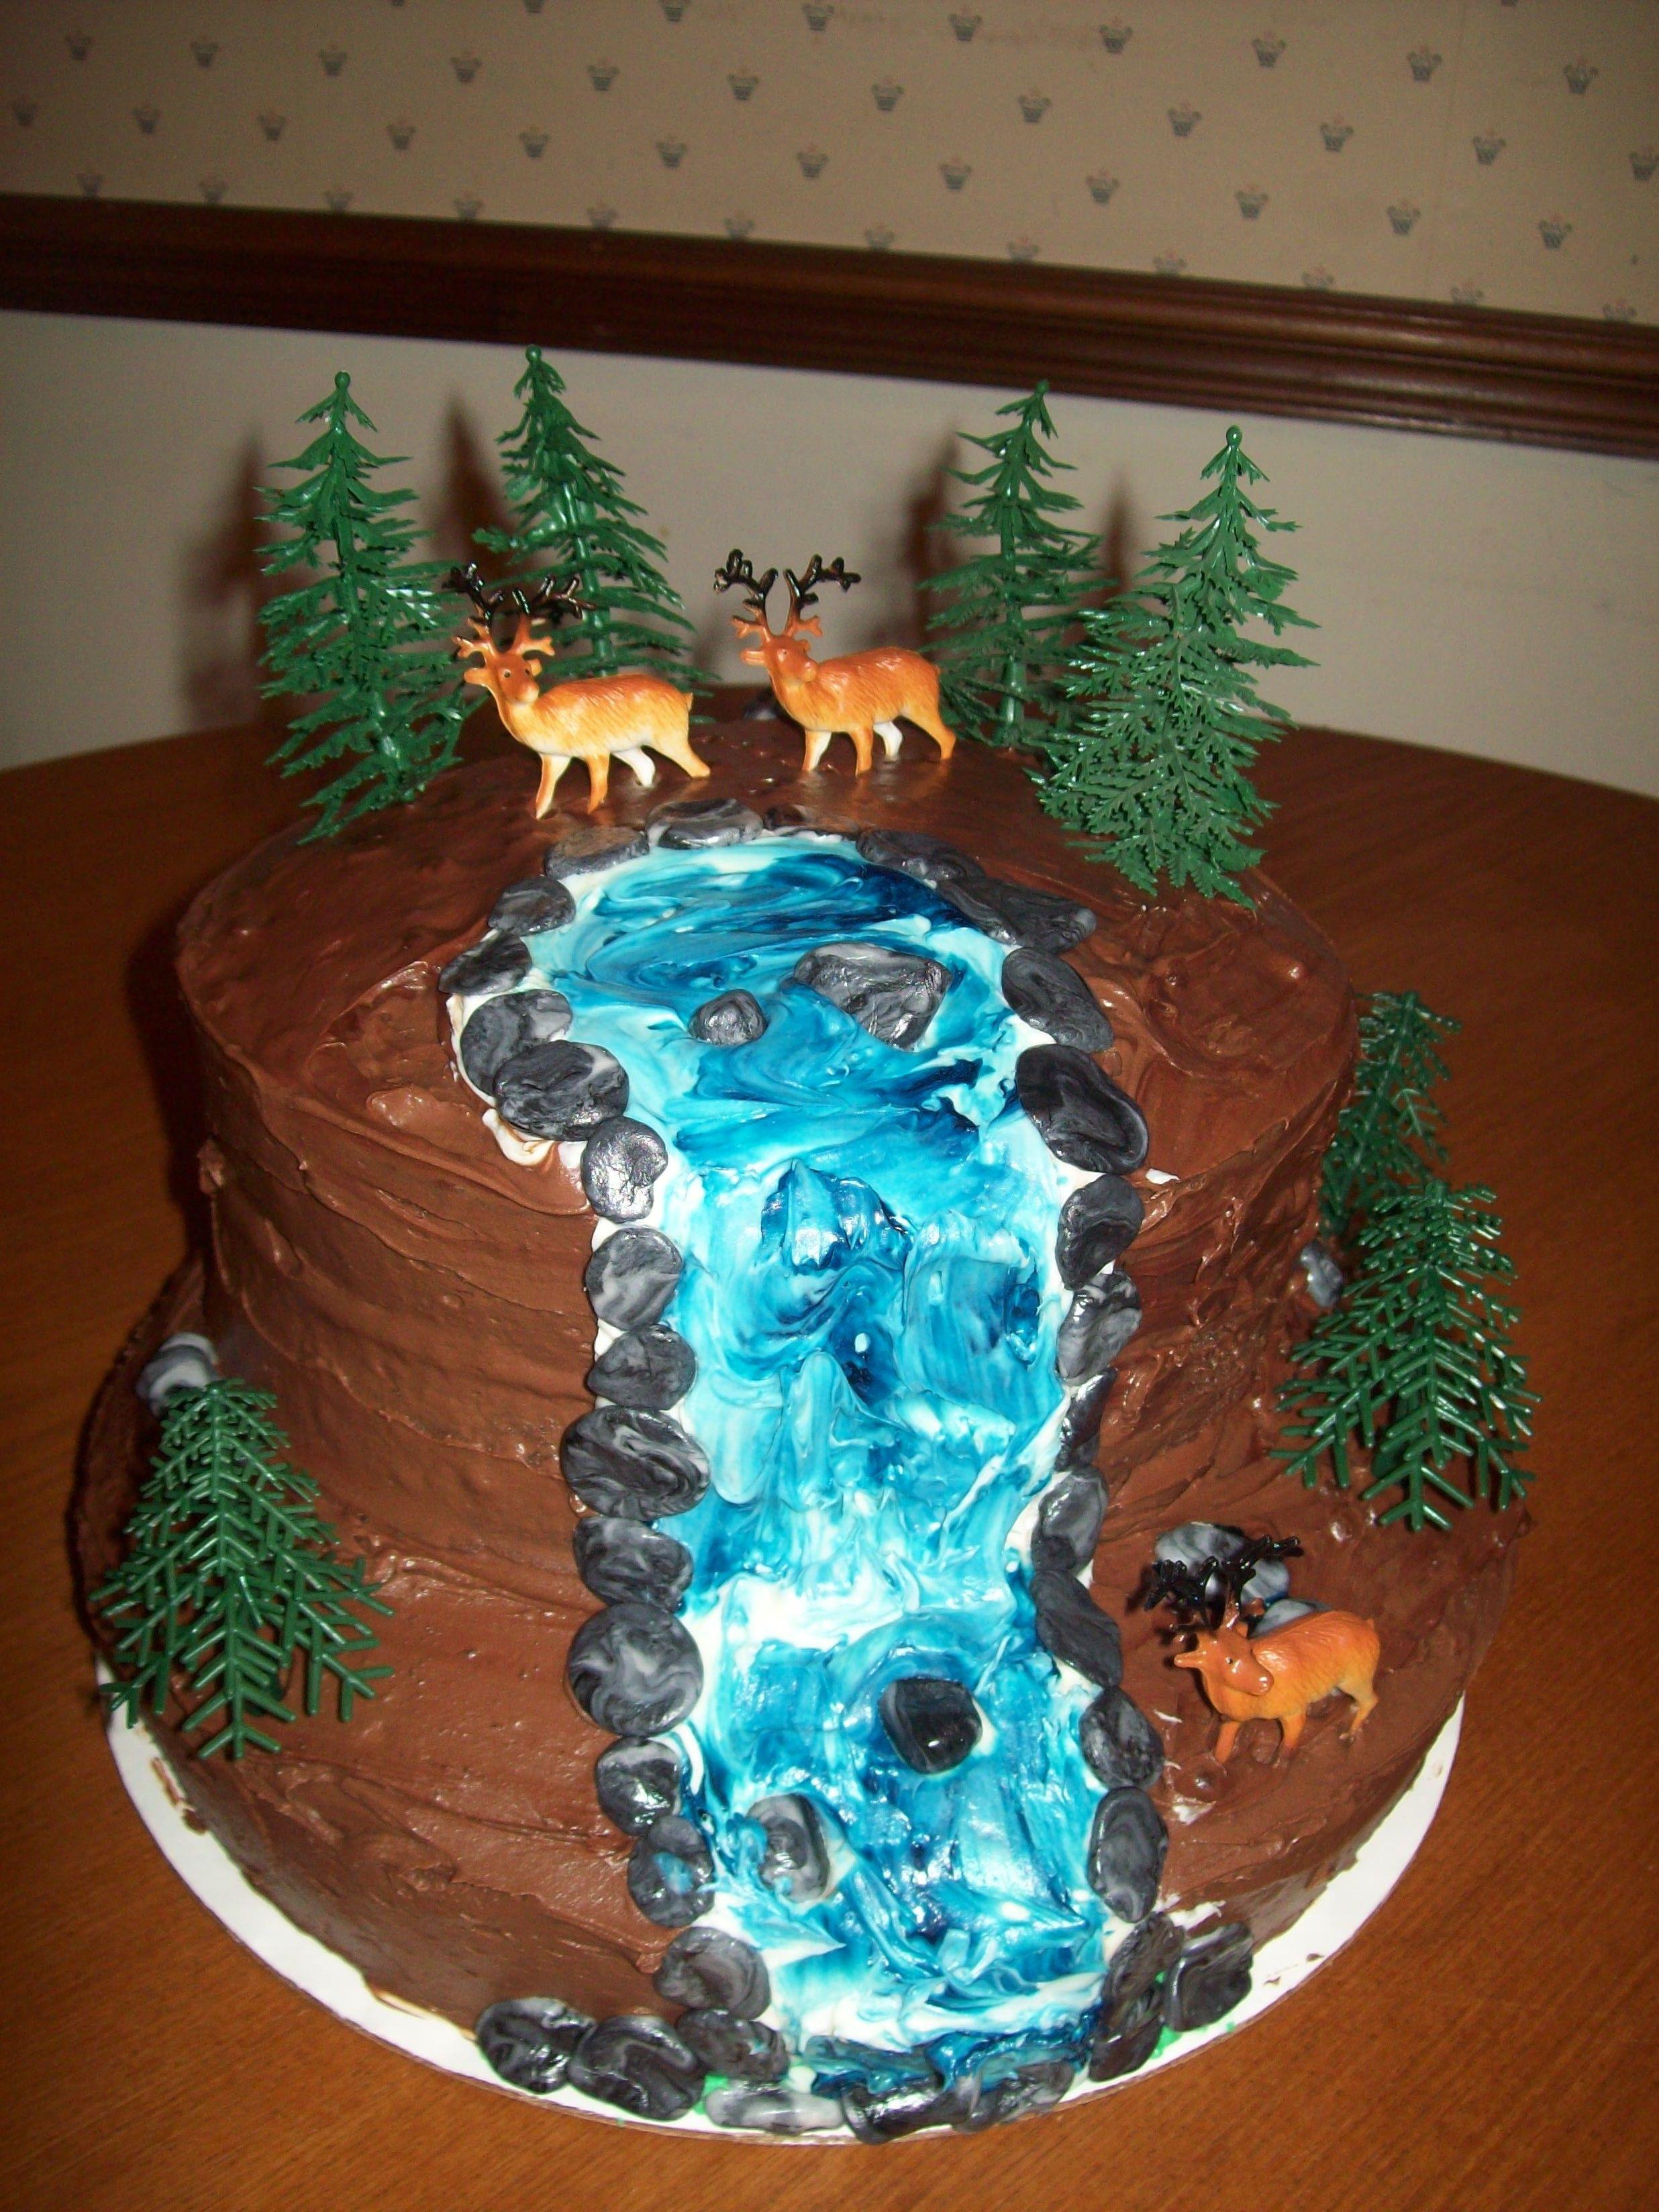 Wedding Cakes With Waterfalls  Waterfall Cake Bake My Day Pinterest